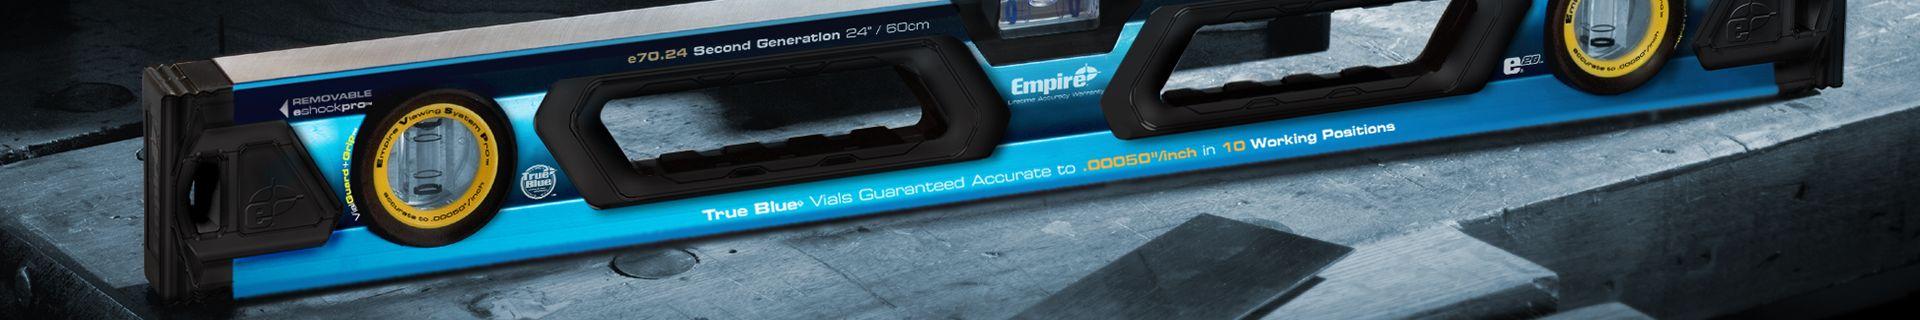 Empire measuring tool